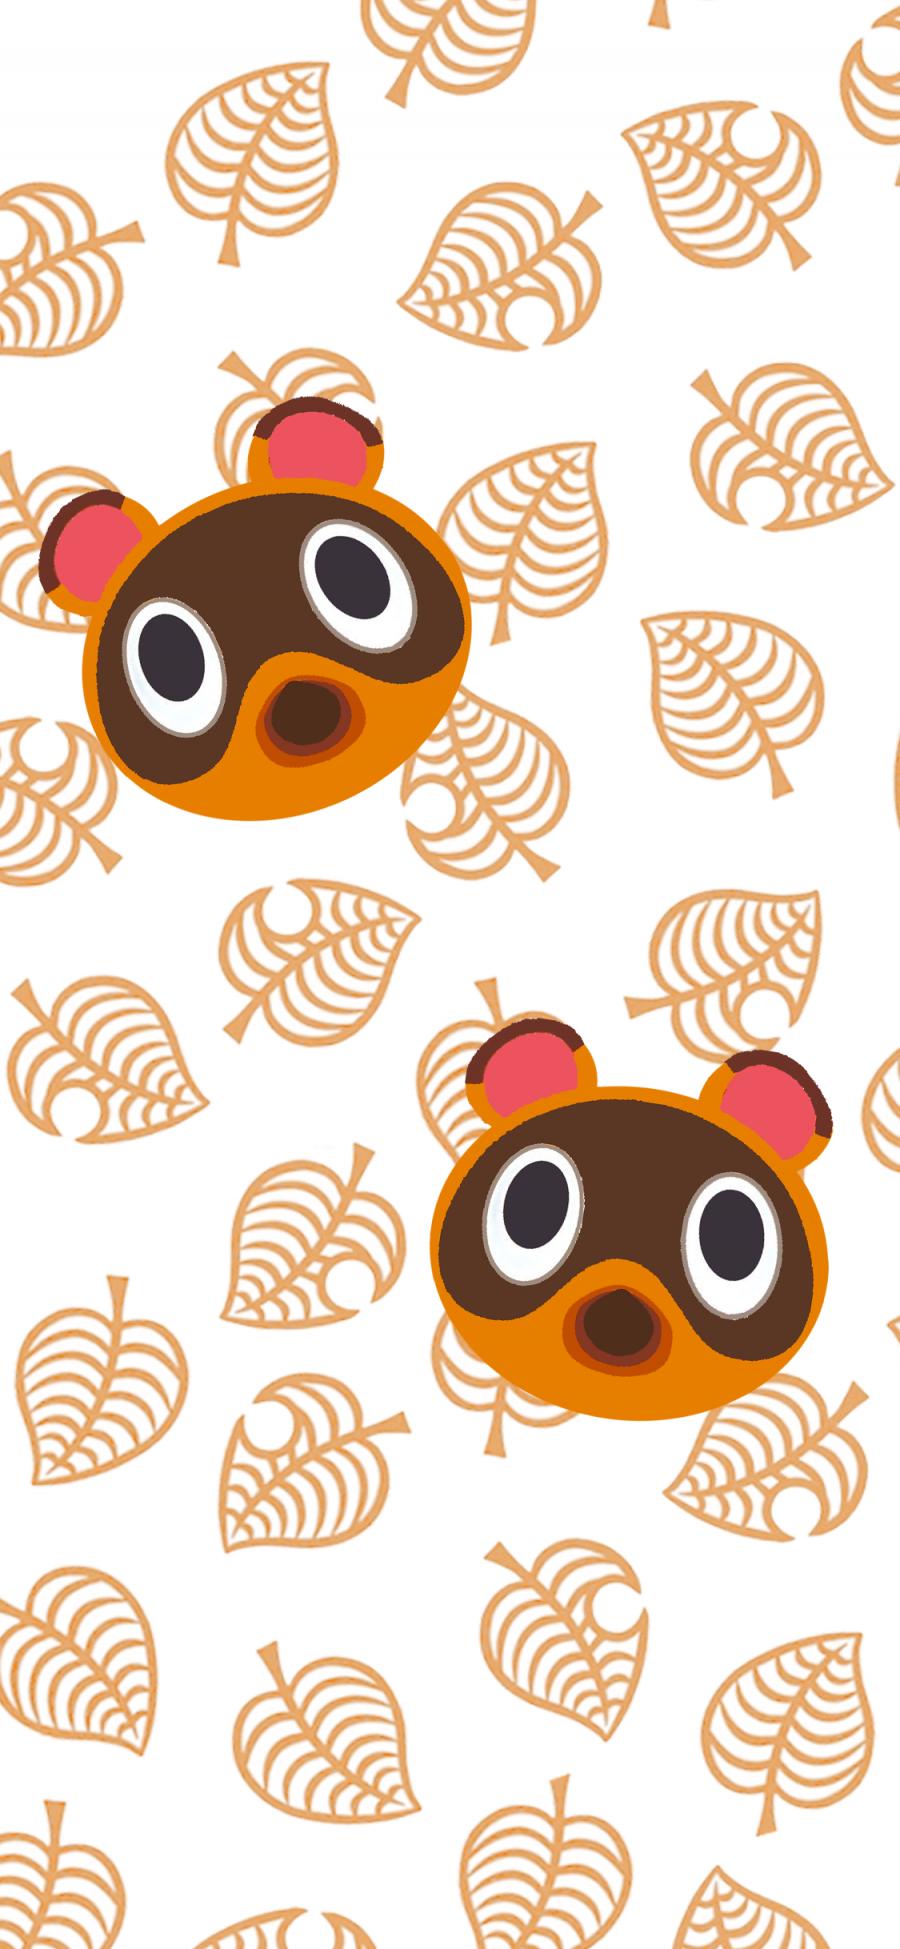 Animal Crossing New Horizons Mobile and Desktop